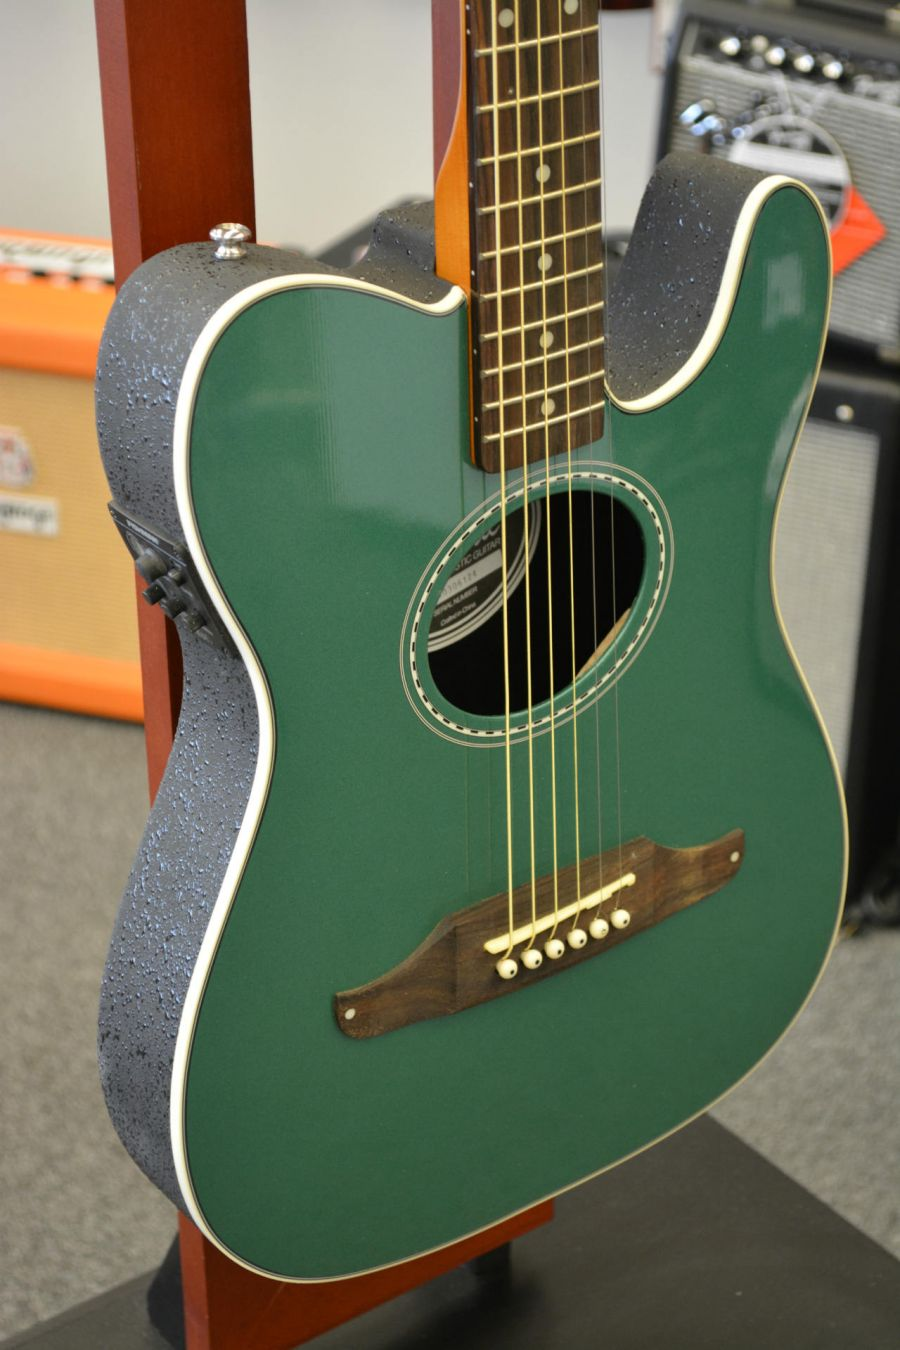 fender telecoustic plus acoustic electric guitar sherwood green ebay. Black Bedroom Furniture Sets. Home Design Ideas